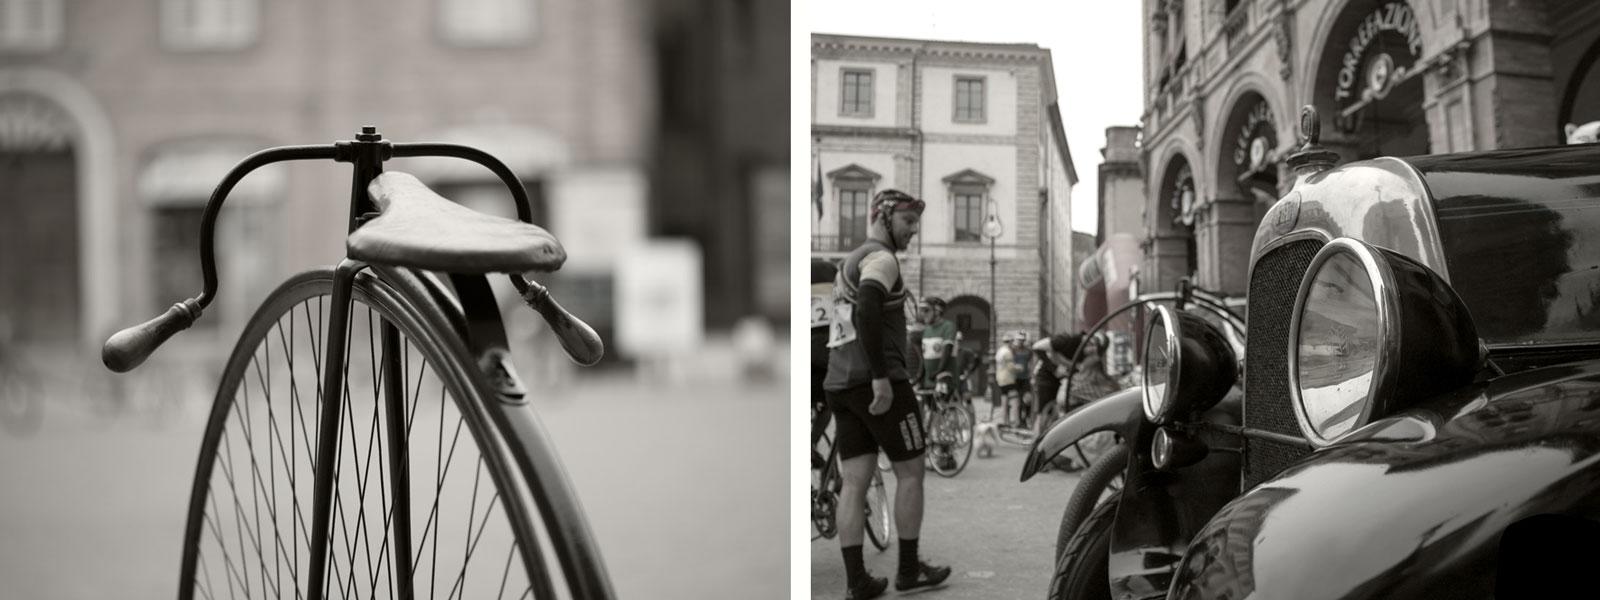 CicloColli Storica manifestazione bici epoca marche